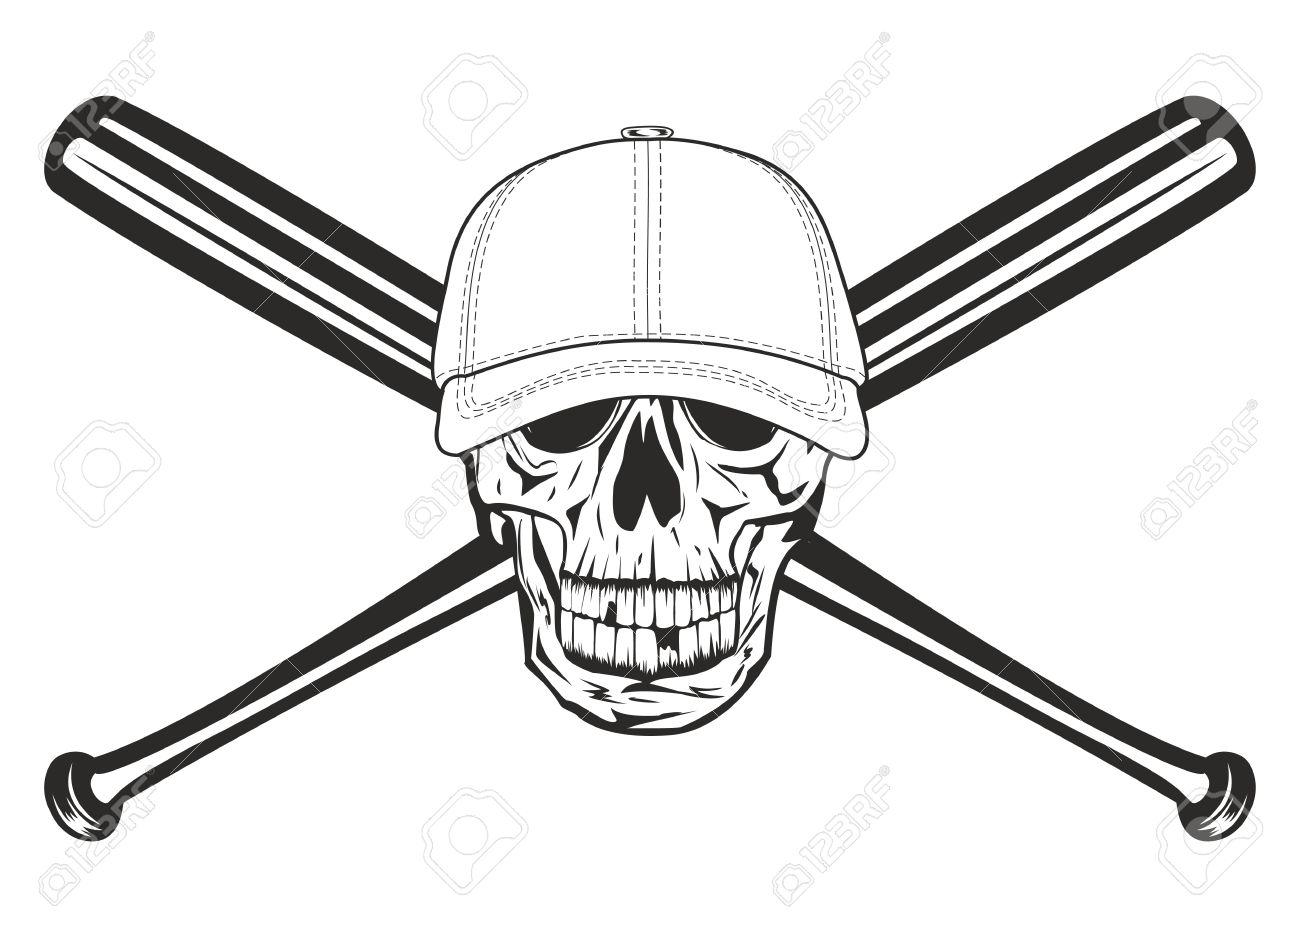 the image skull in baseball cap and crossed bats royalty free rh 123rf com Baseball Bat Clip Art Baseball Bat Clip Art Vector